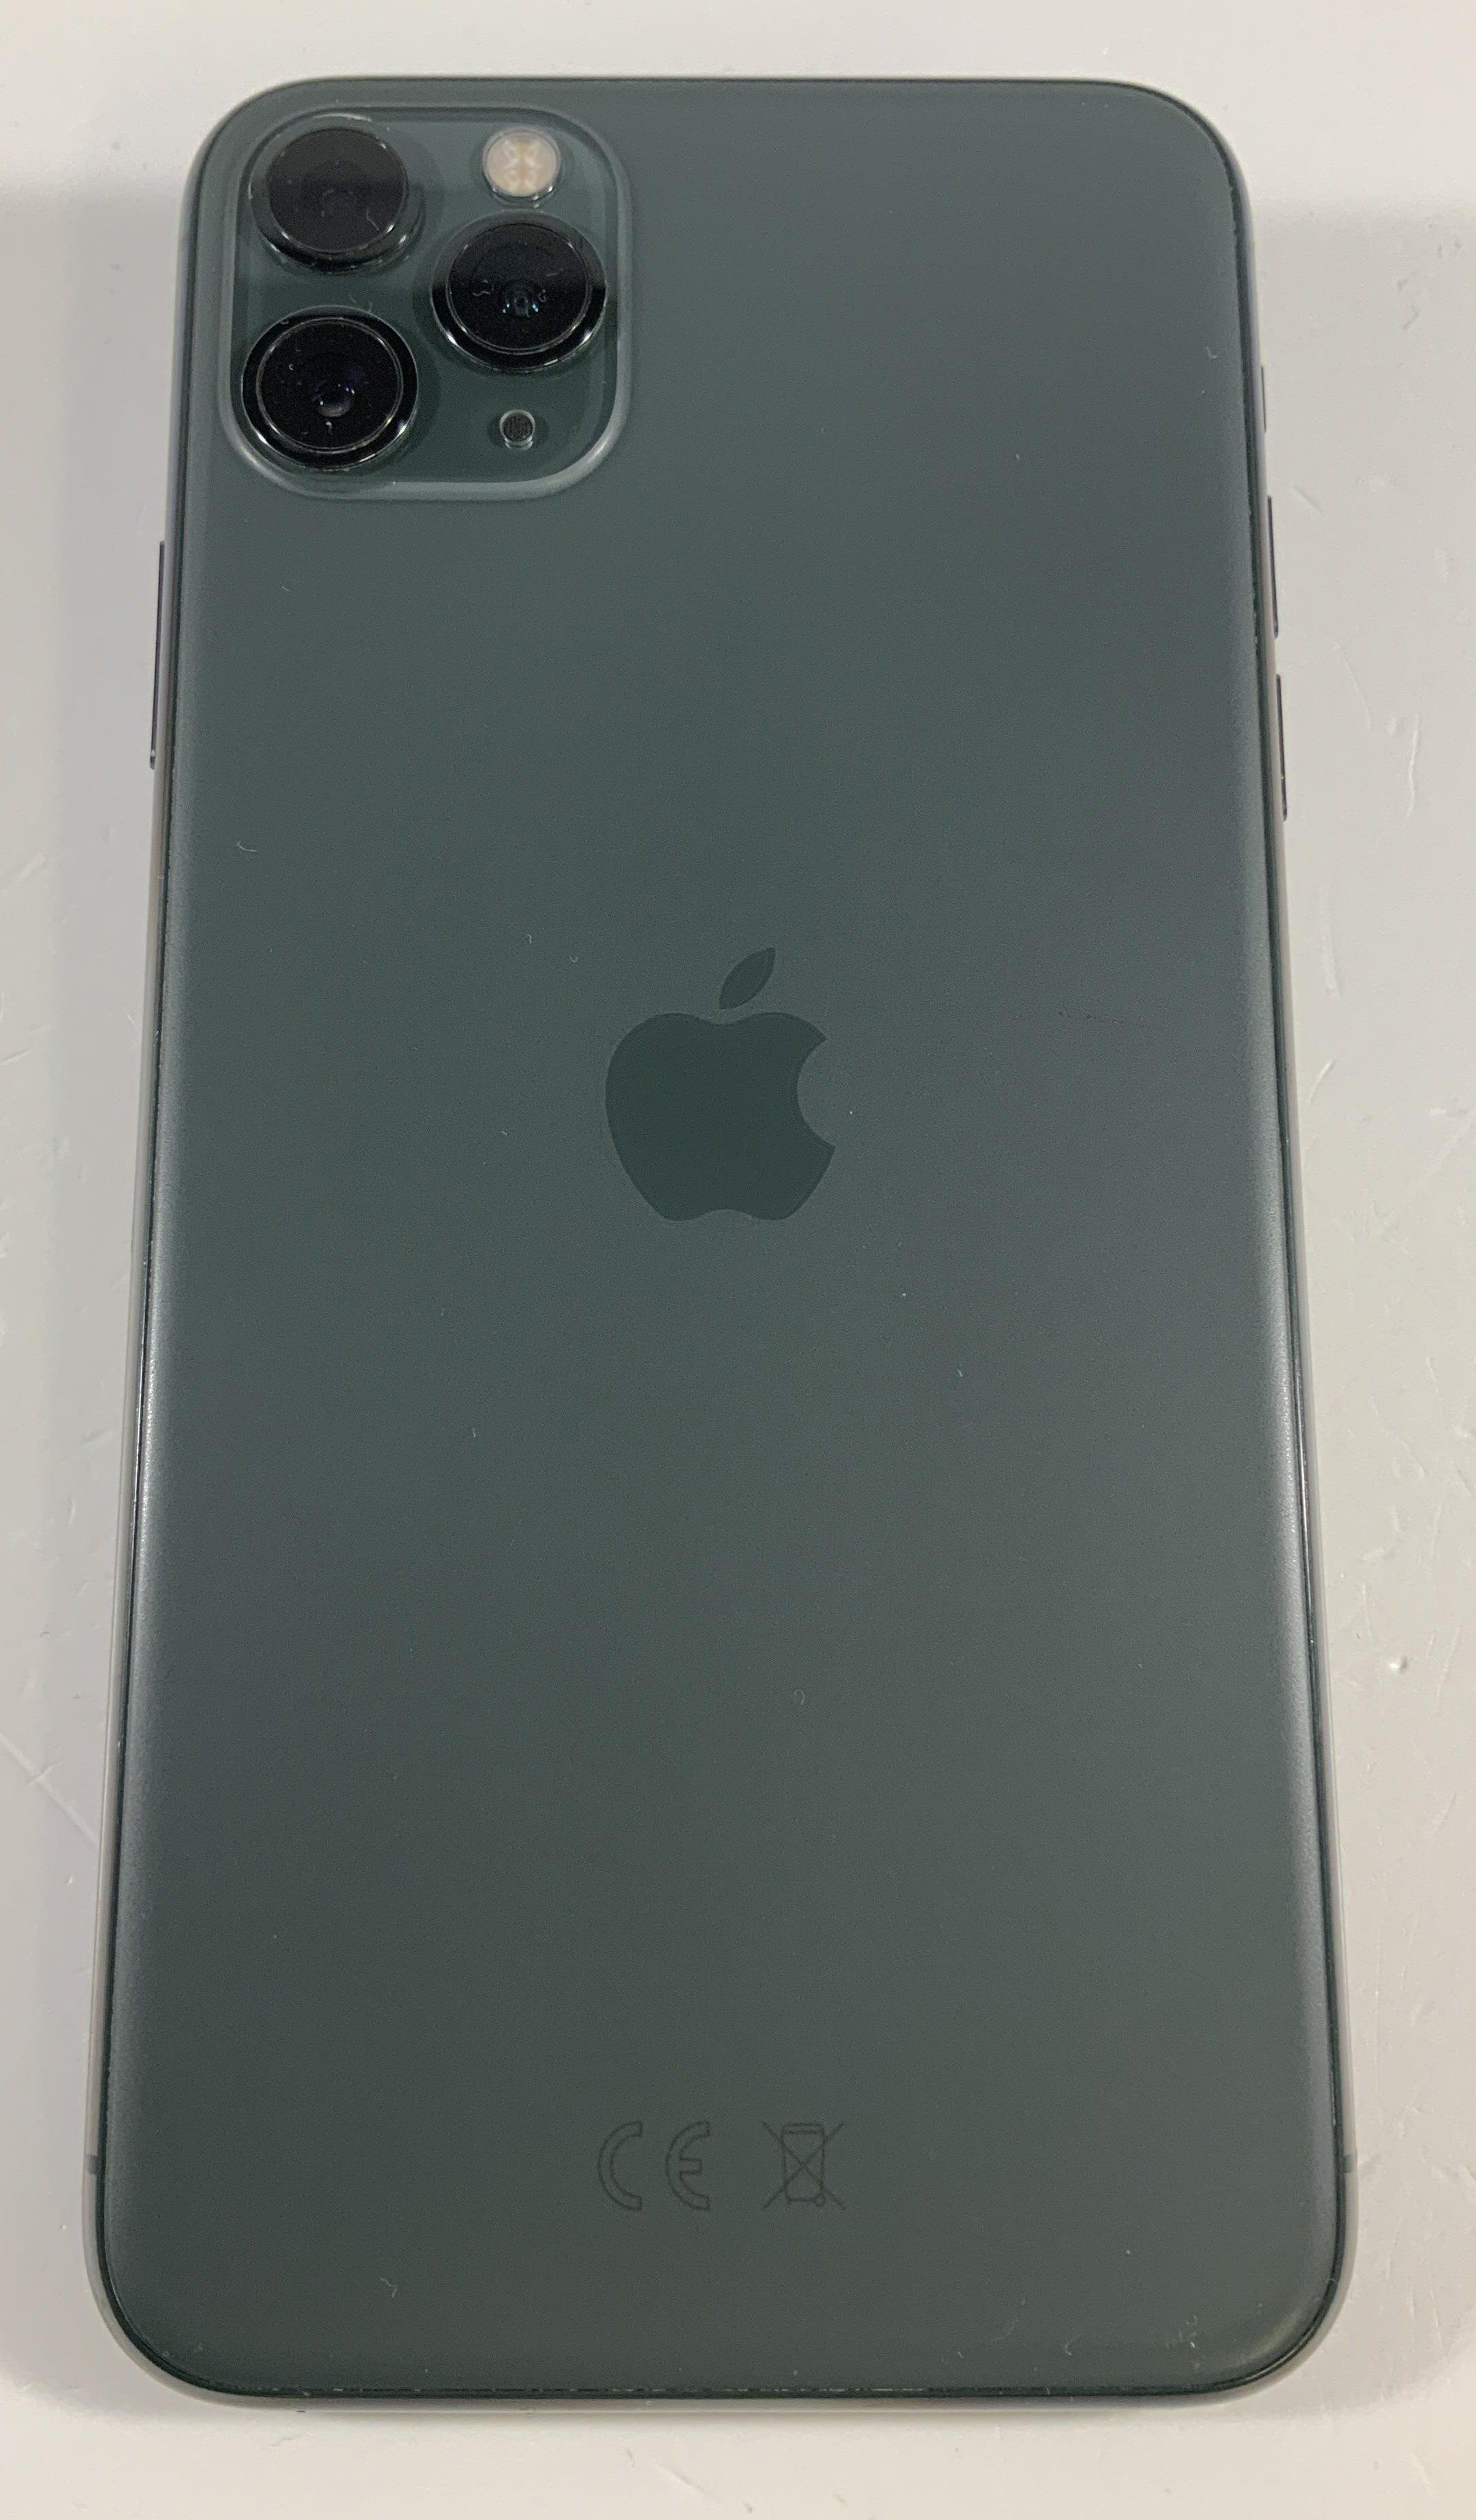 iPhone 11 Pro Max 64GB, 64GB, Midnight Green, Afbeelding 2